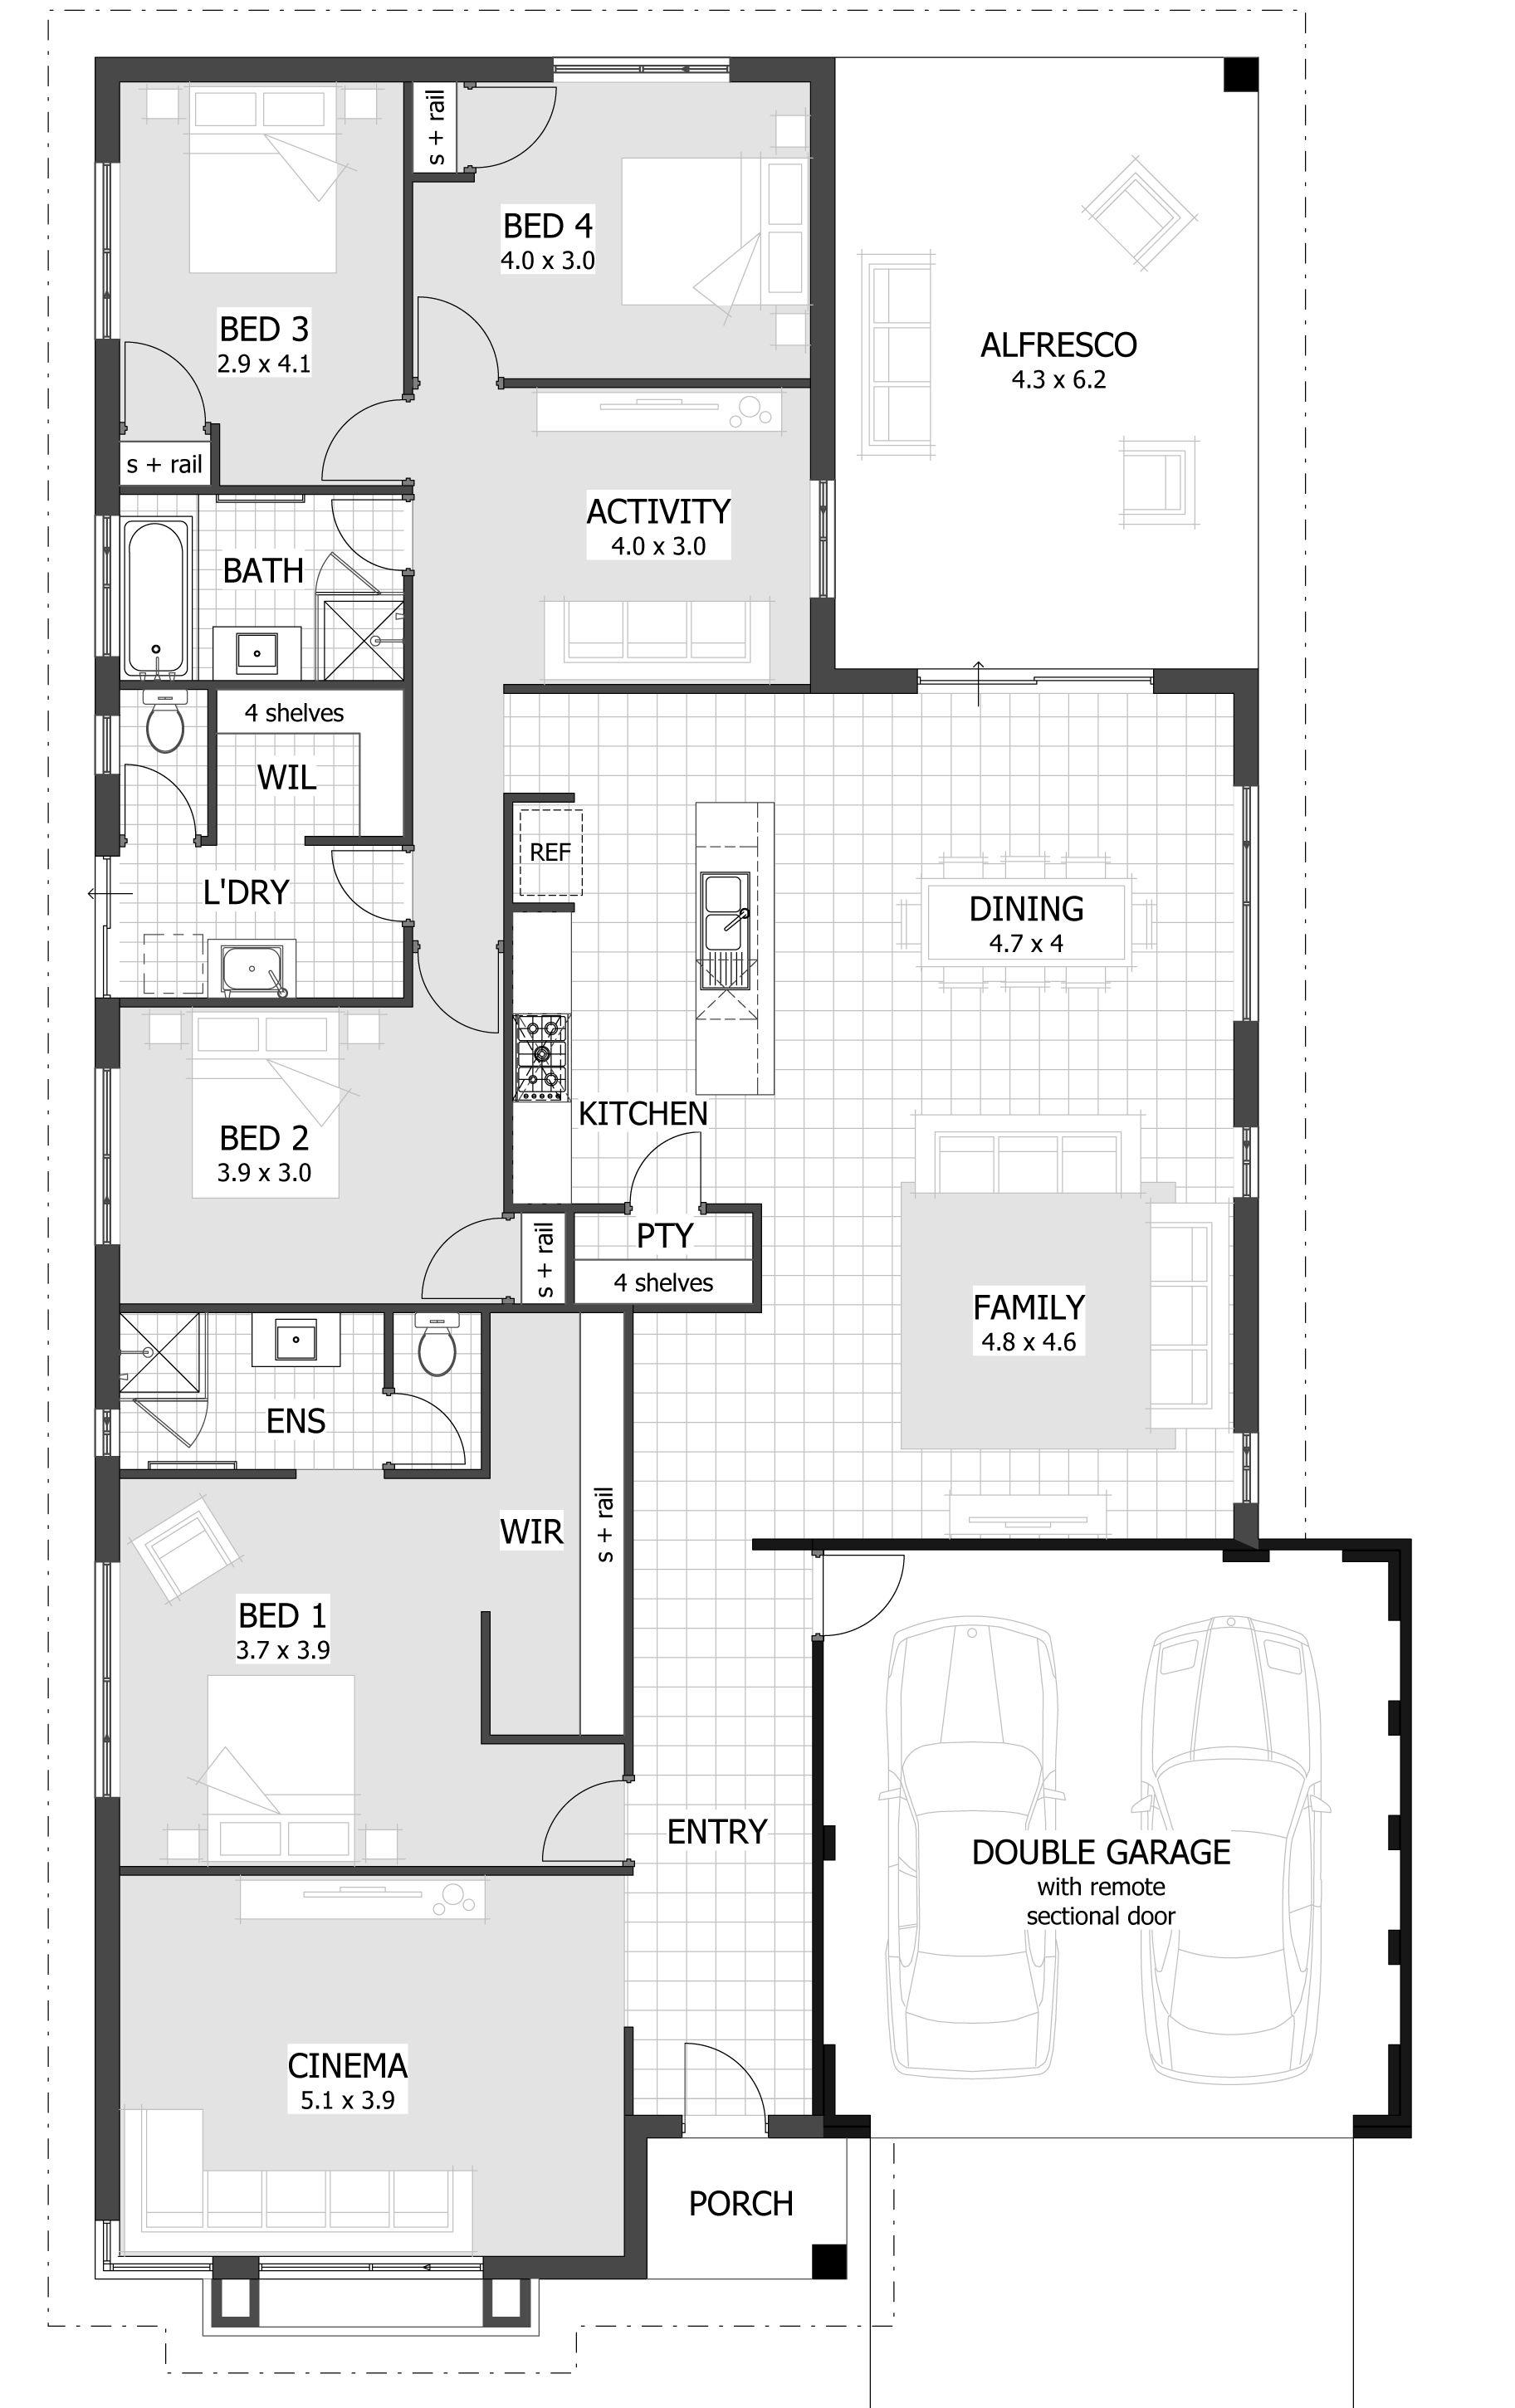 House designs perth new single storey home also rh pinterest